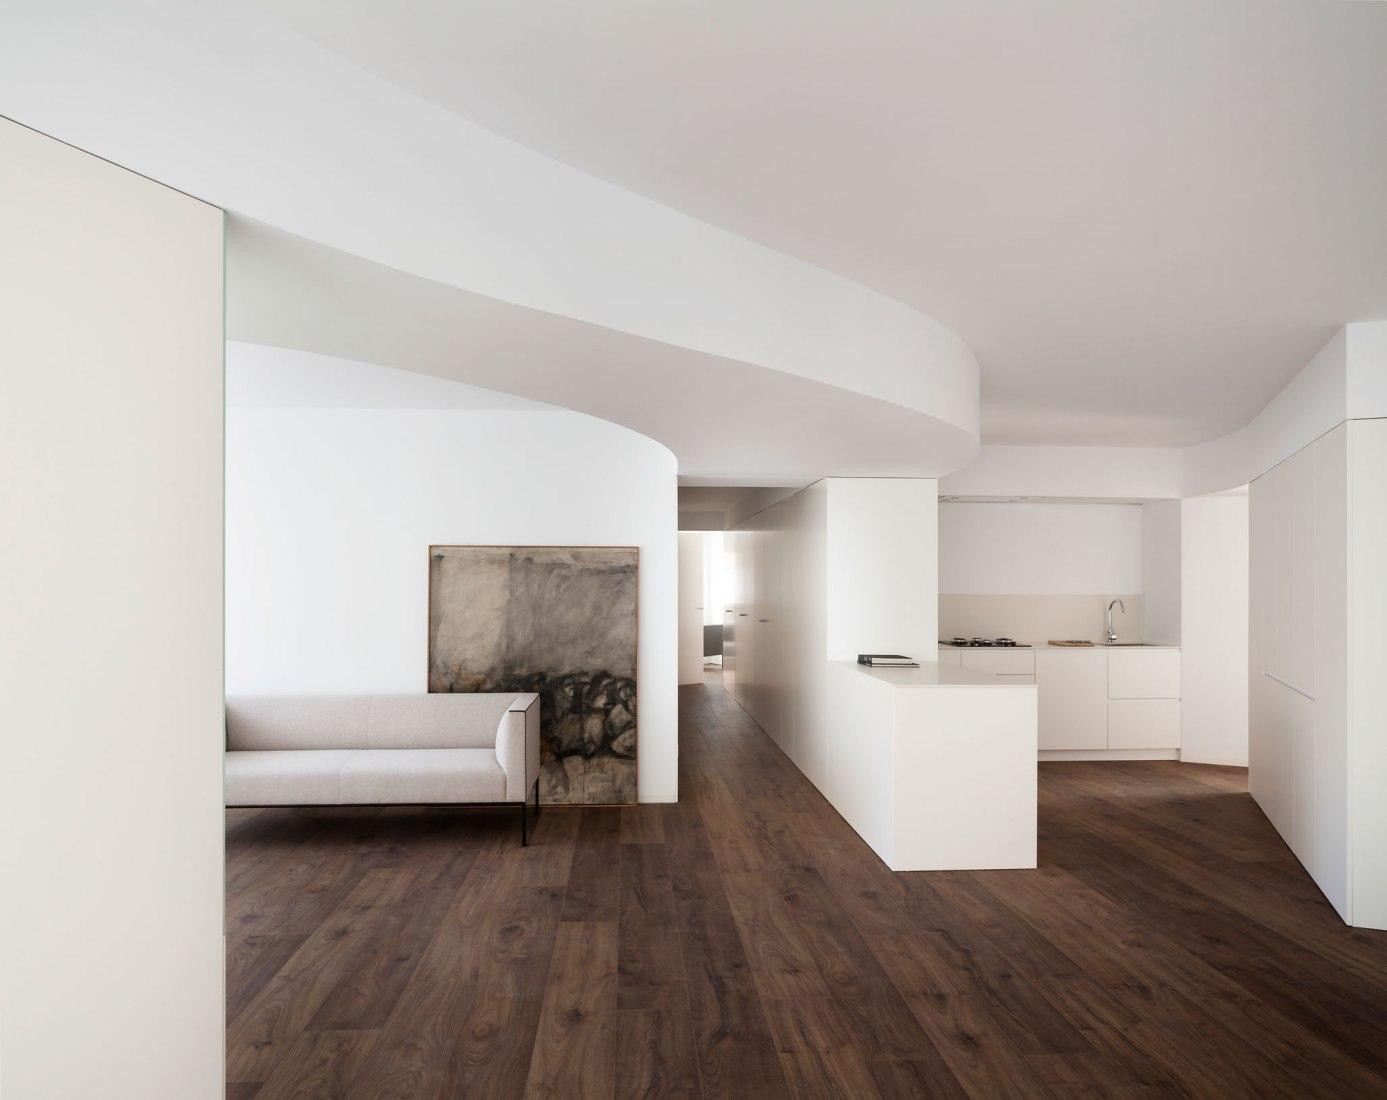 GVFC Apartment by Balzar Arquitectos. Photograph by David Zarzoso.